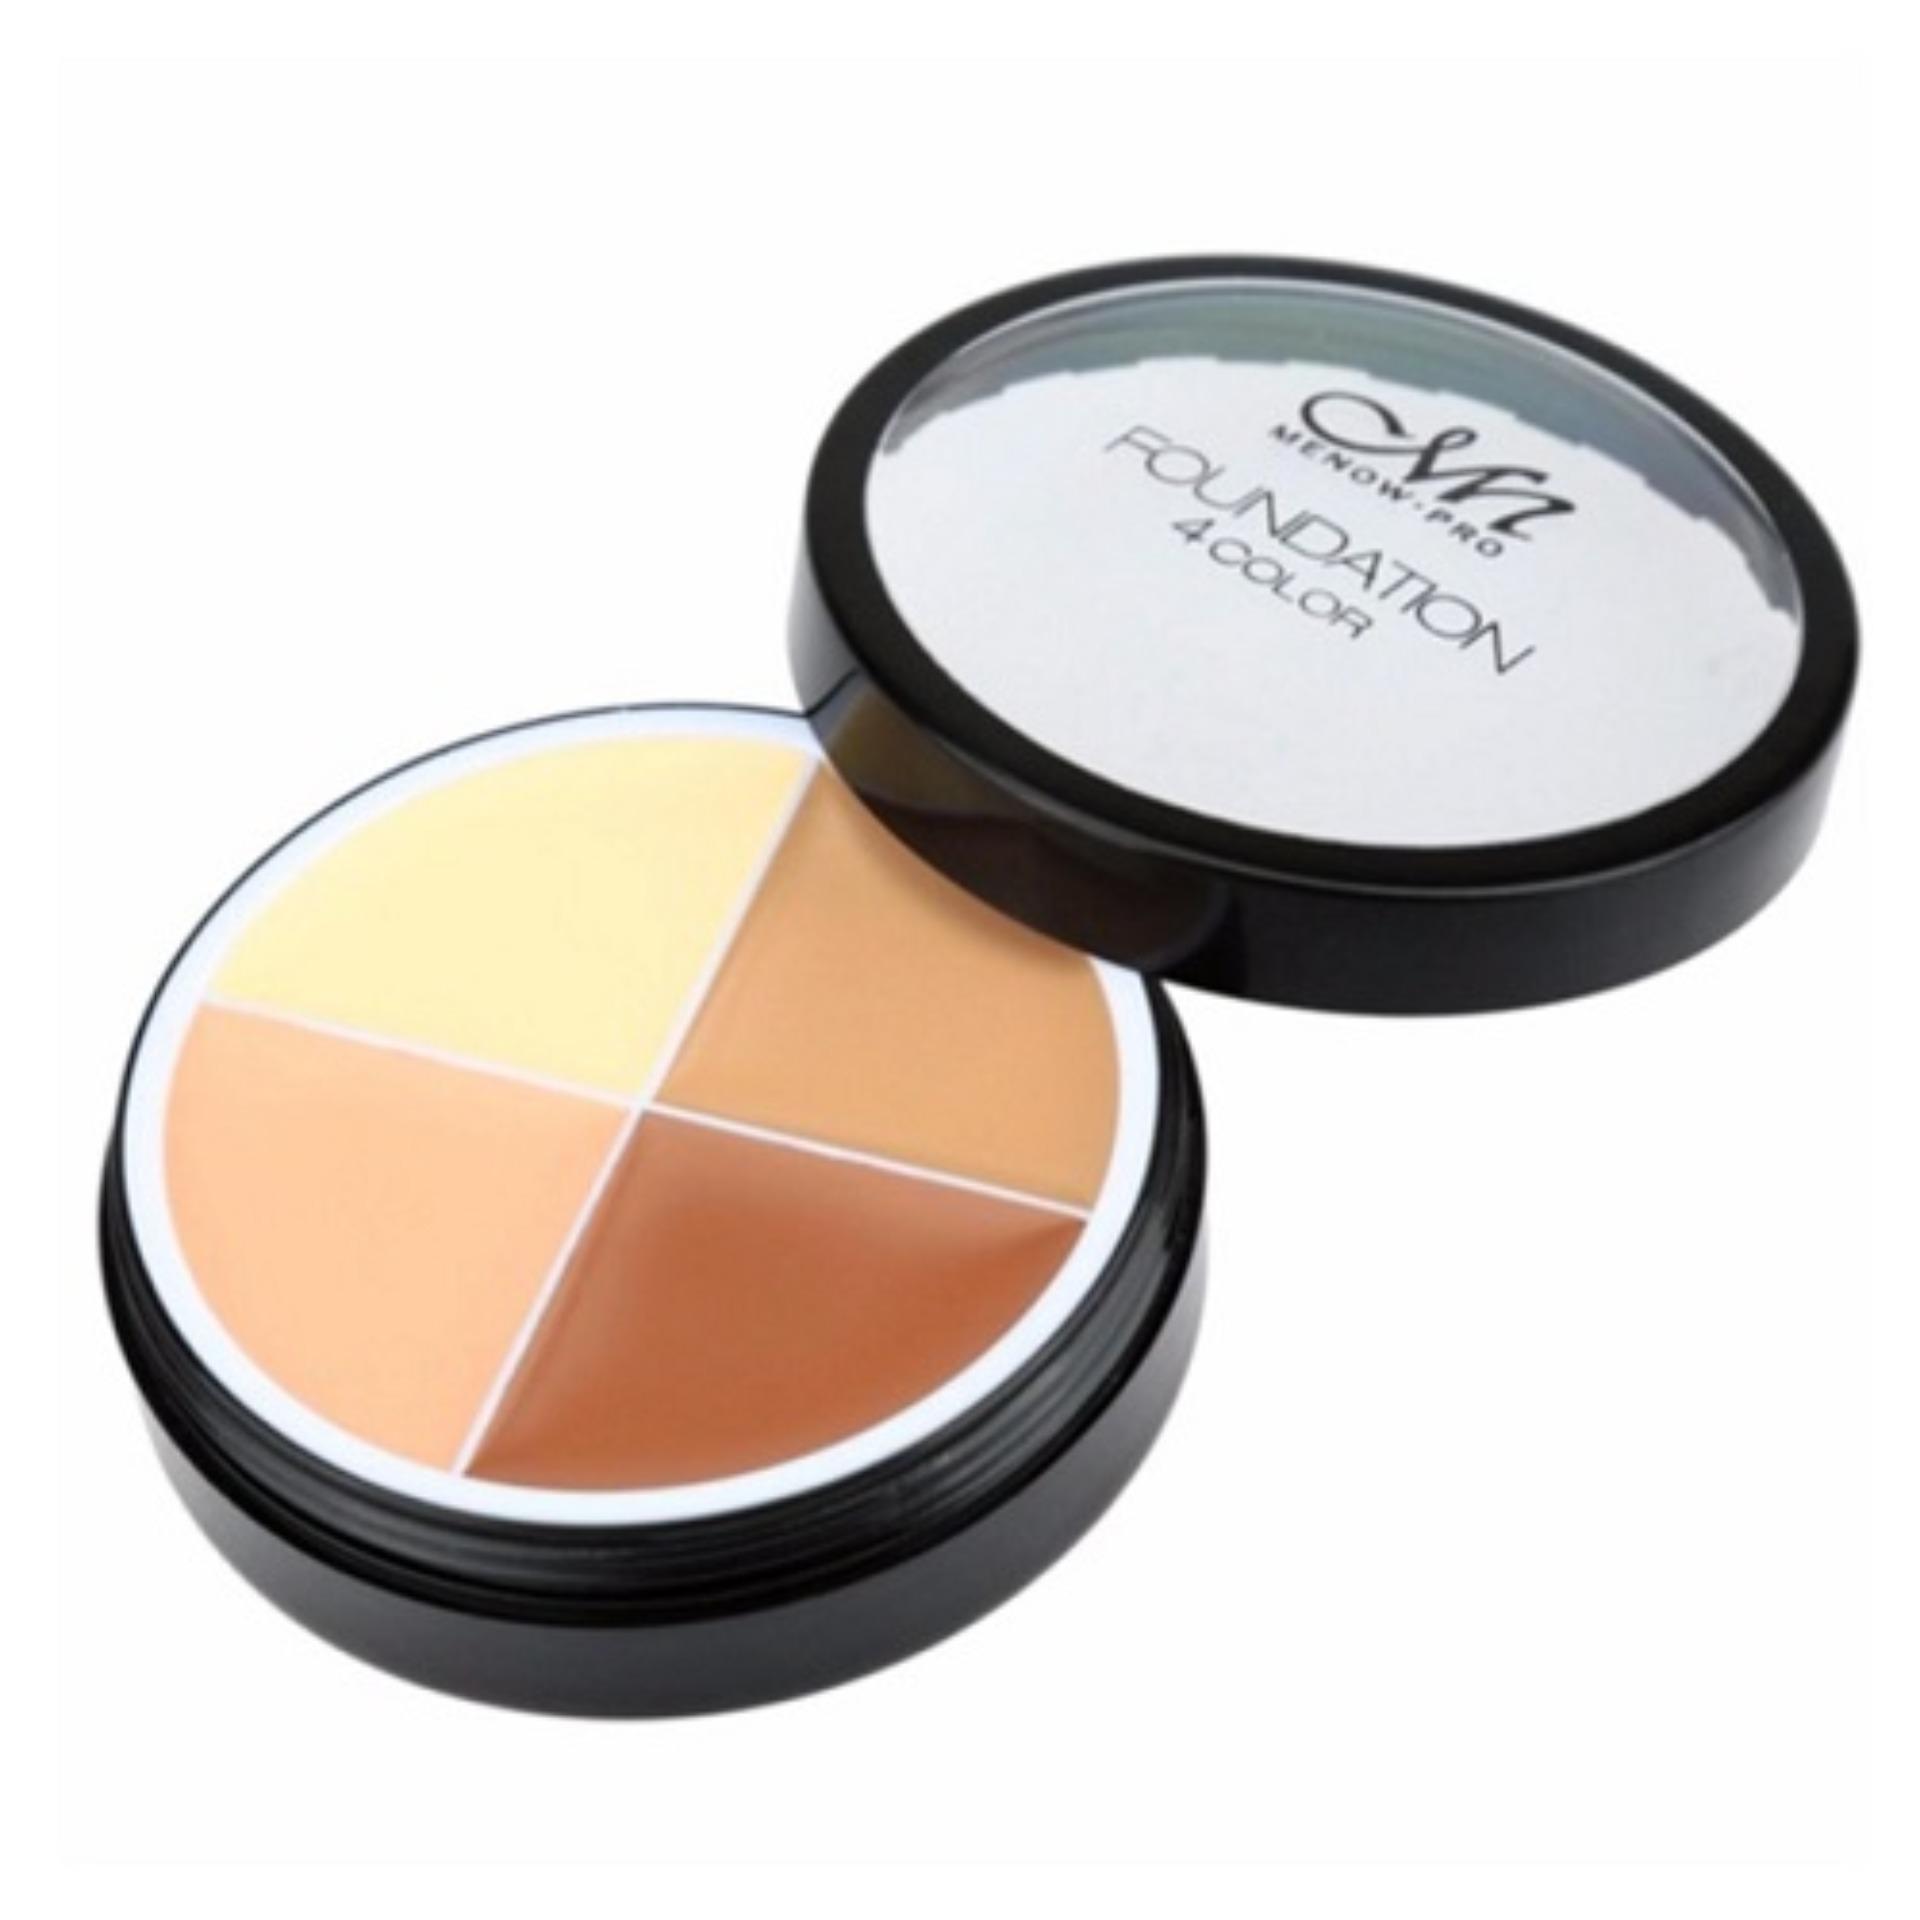 Bioaqua Bb Cream Super Wearing Lasting Concealer Foundation Make Up No 2 Dus Putih Air Cushion Shock Price Irmie Store Mn 1 Pcs Penjualan Hanya Rp28